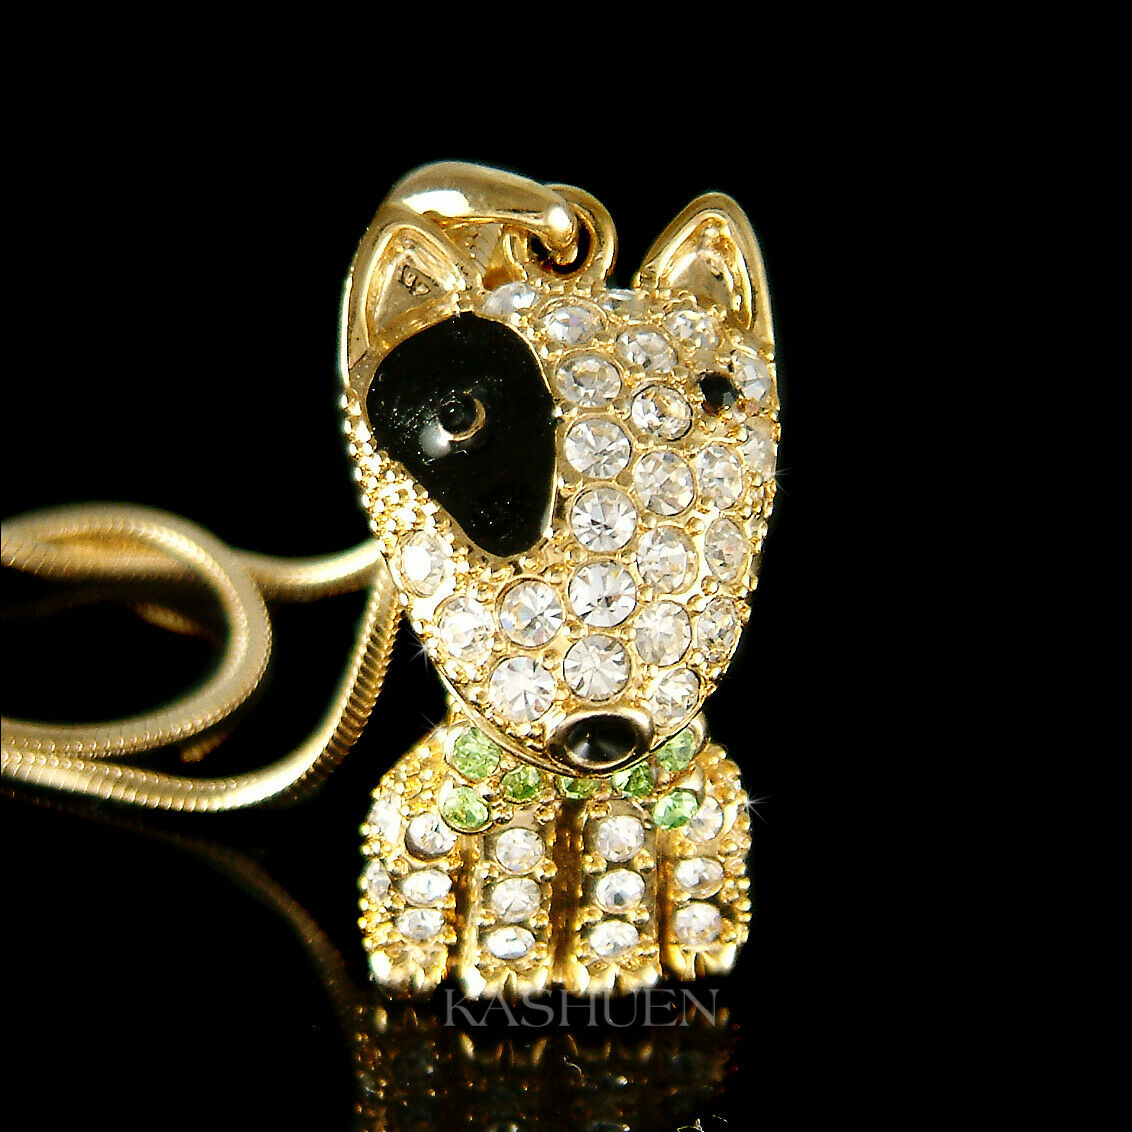 Bull terrier chien bouledogue avec cristal swarovski noir animal collier bijoux